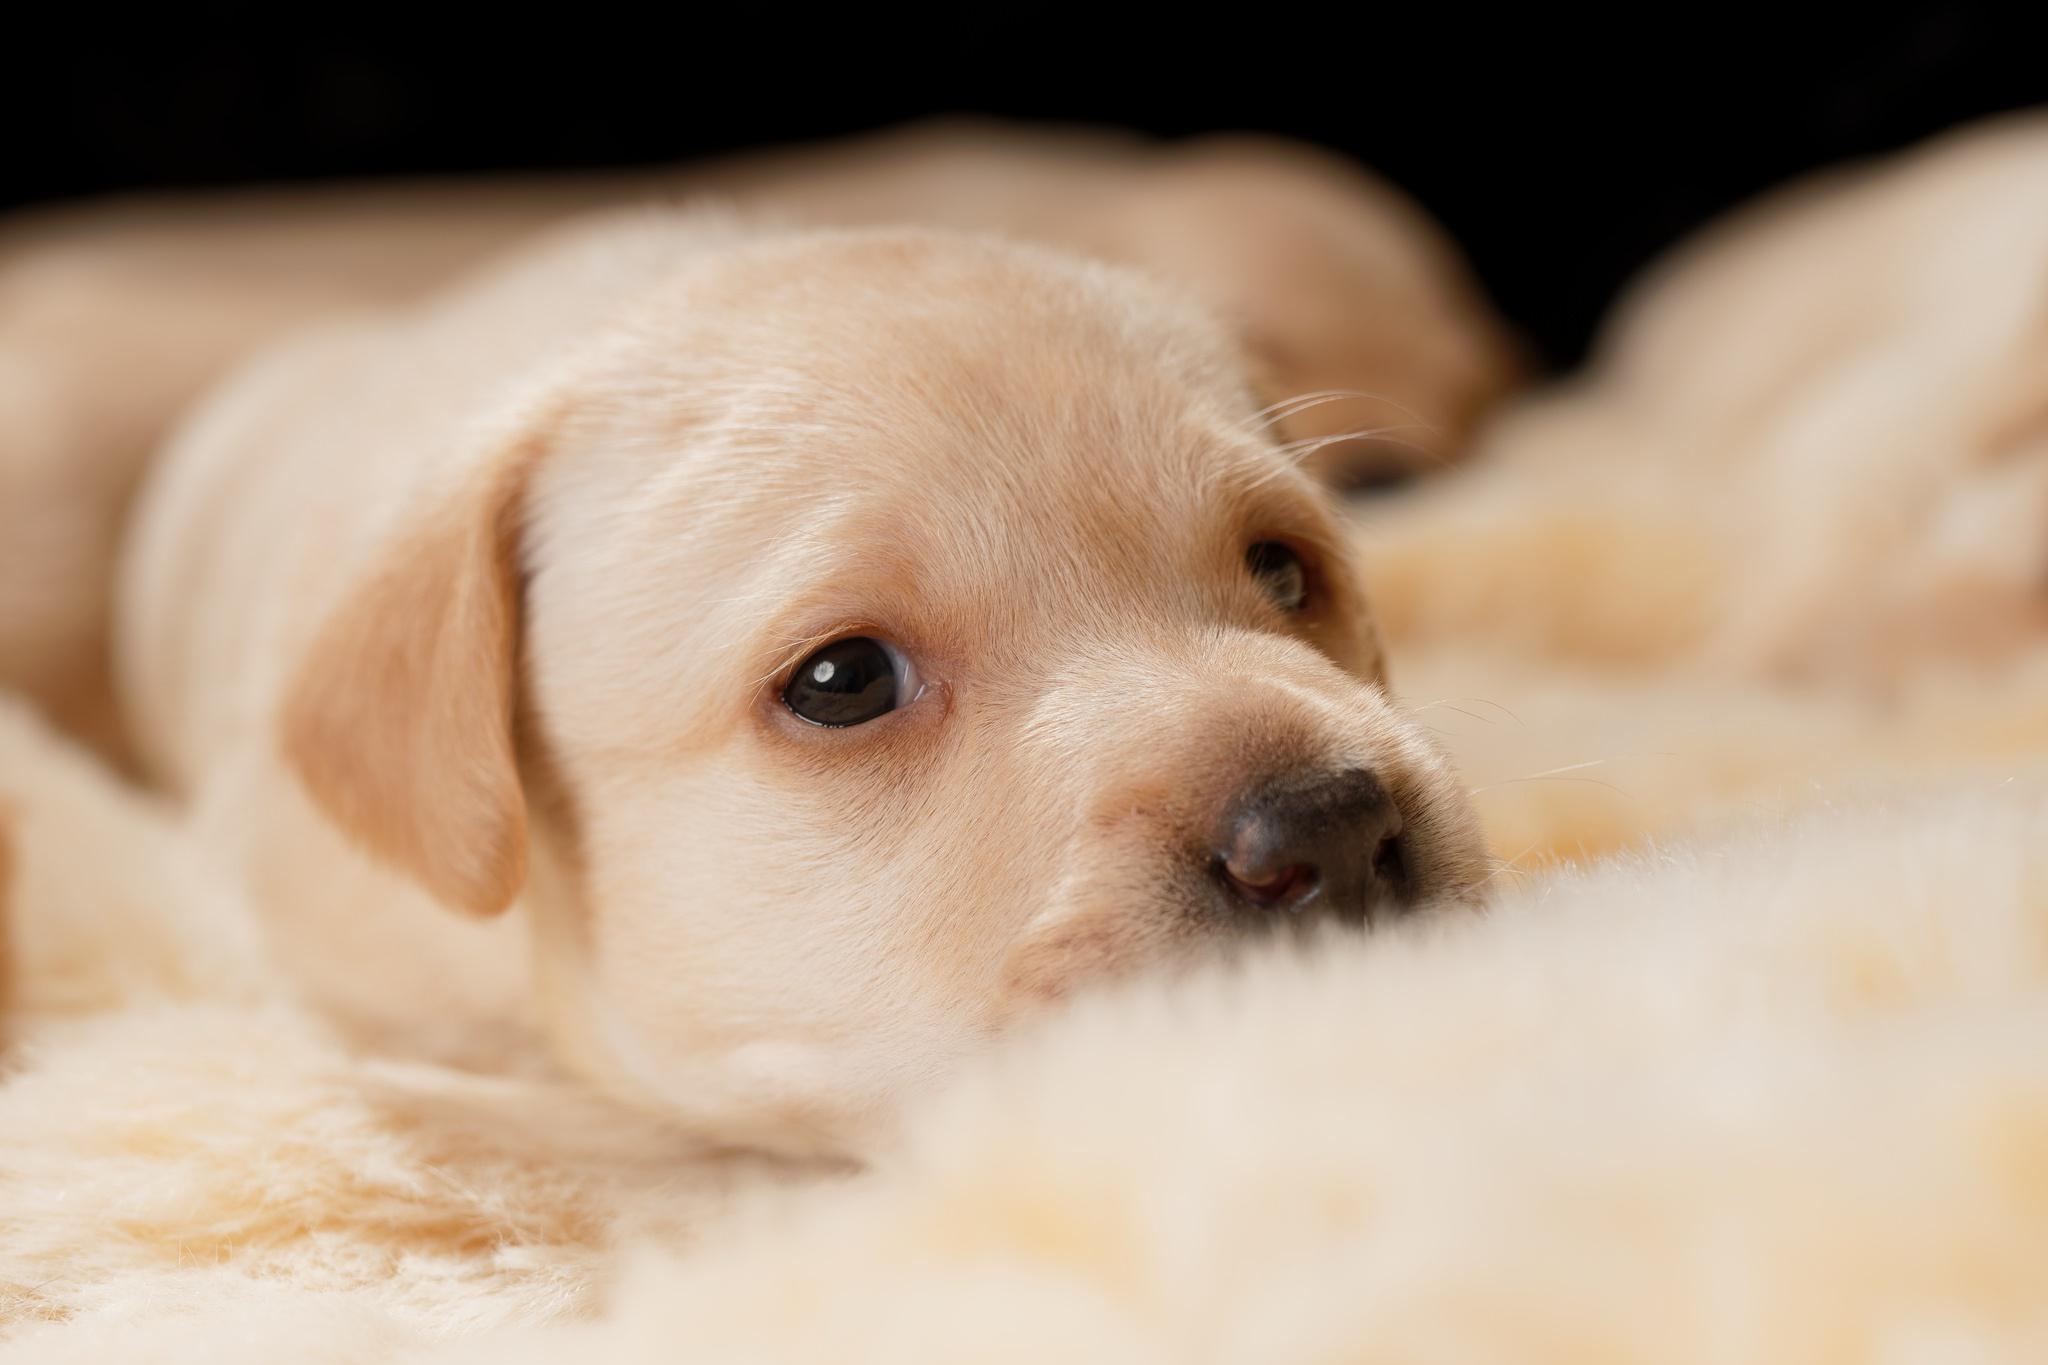 Puppy Dog Pet Baby Animal 2048x1365